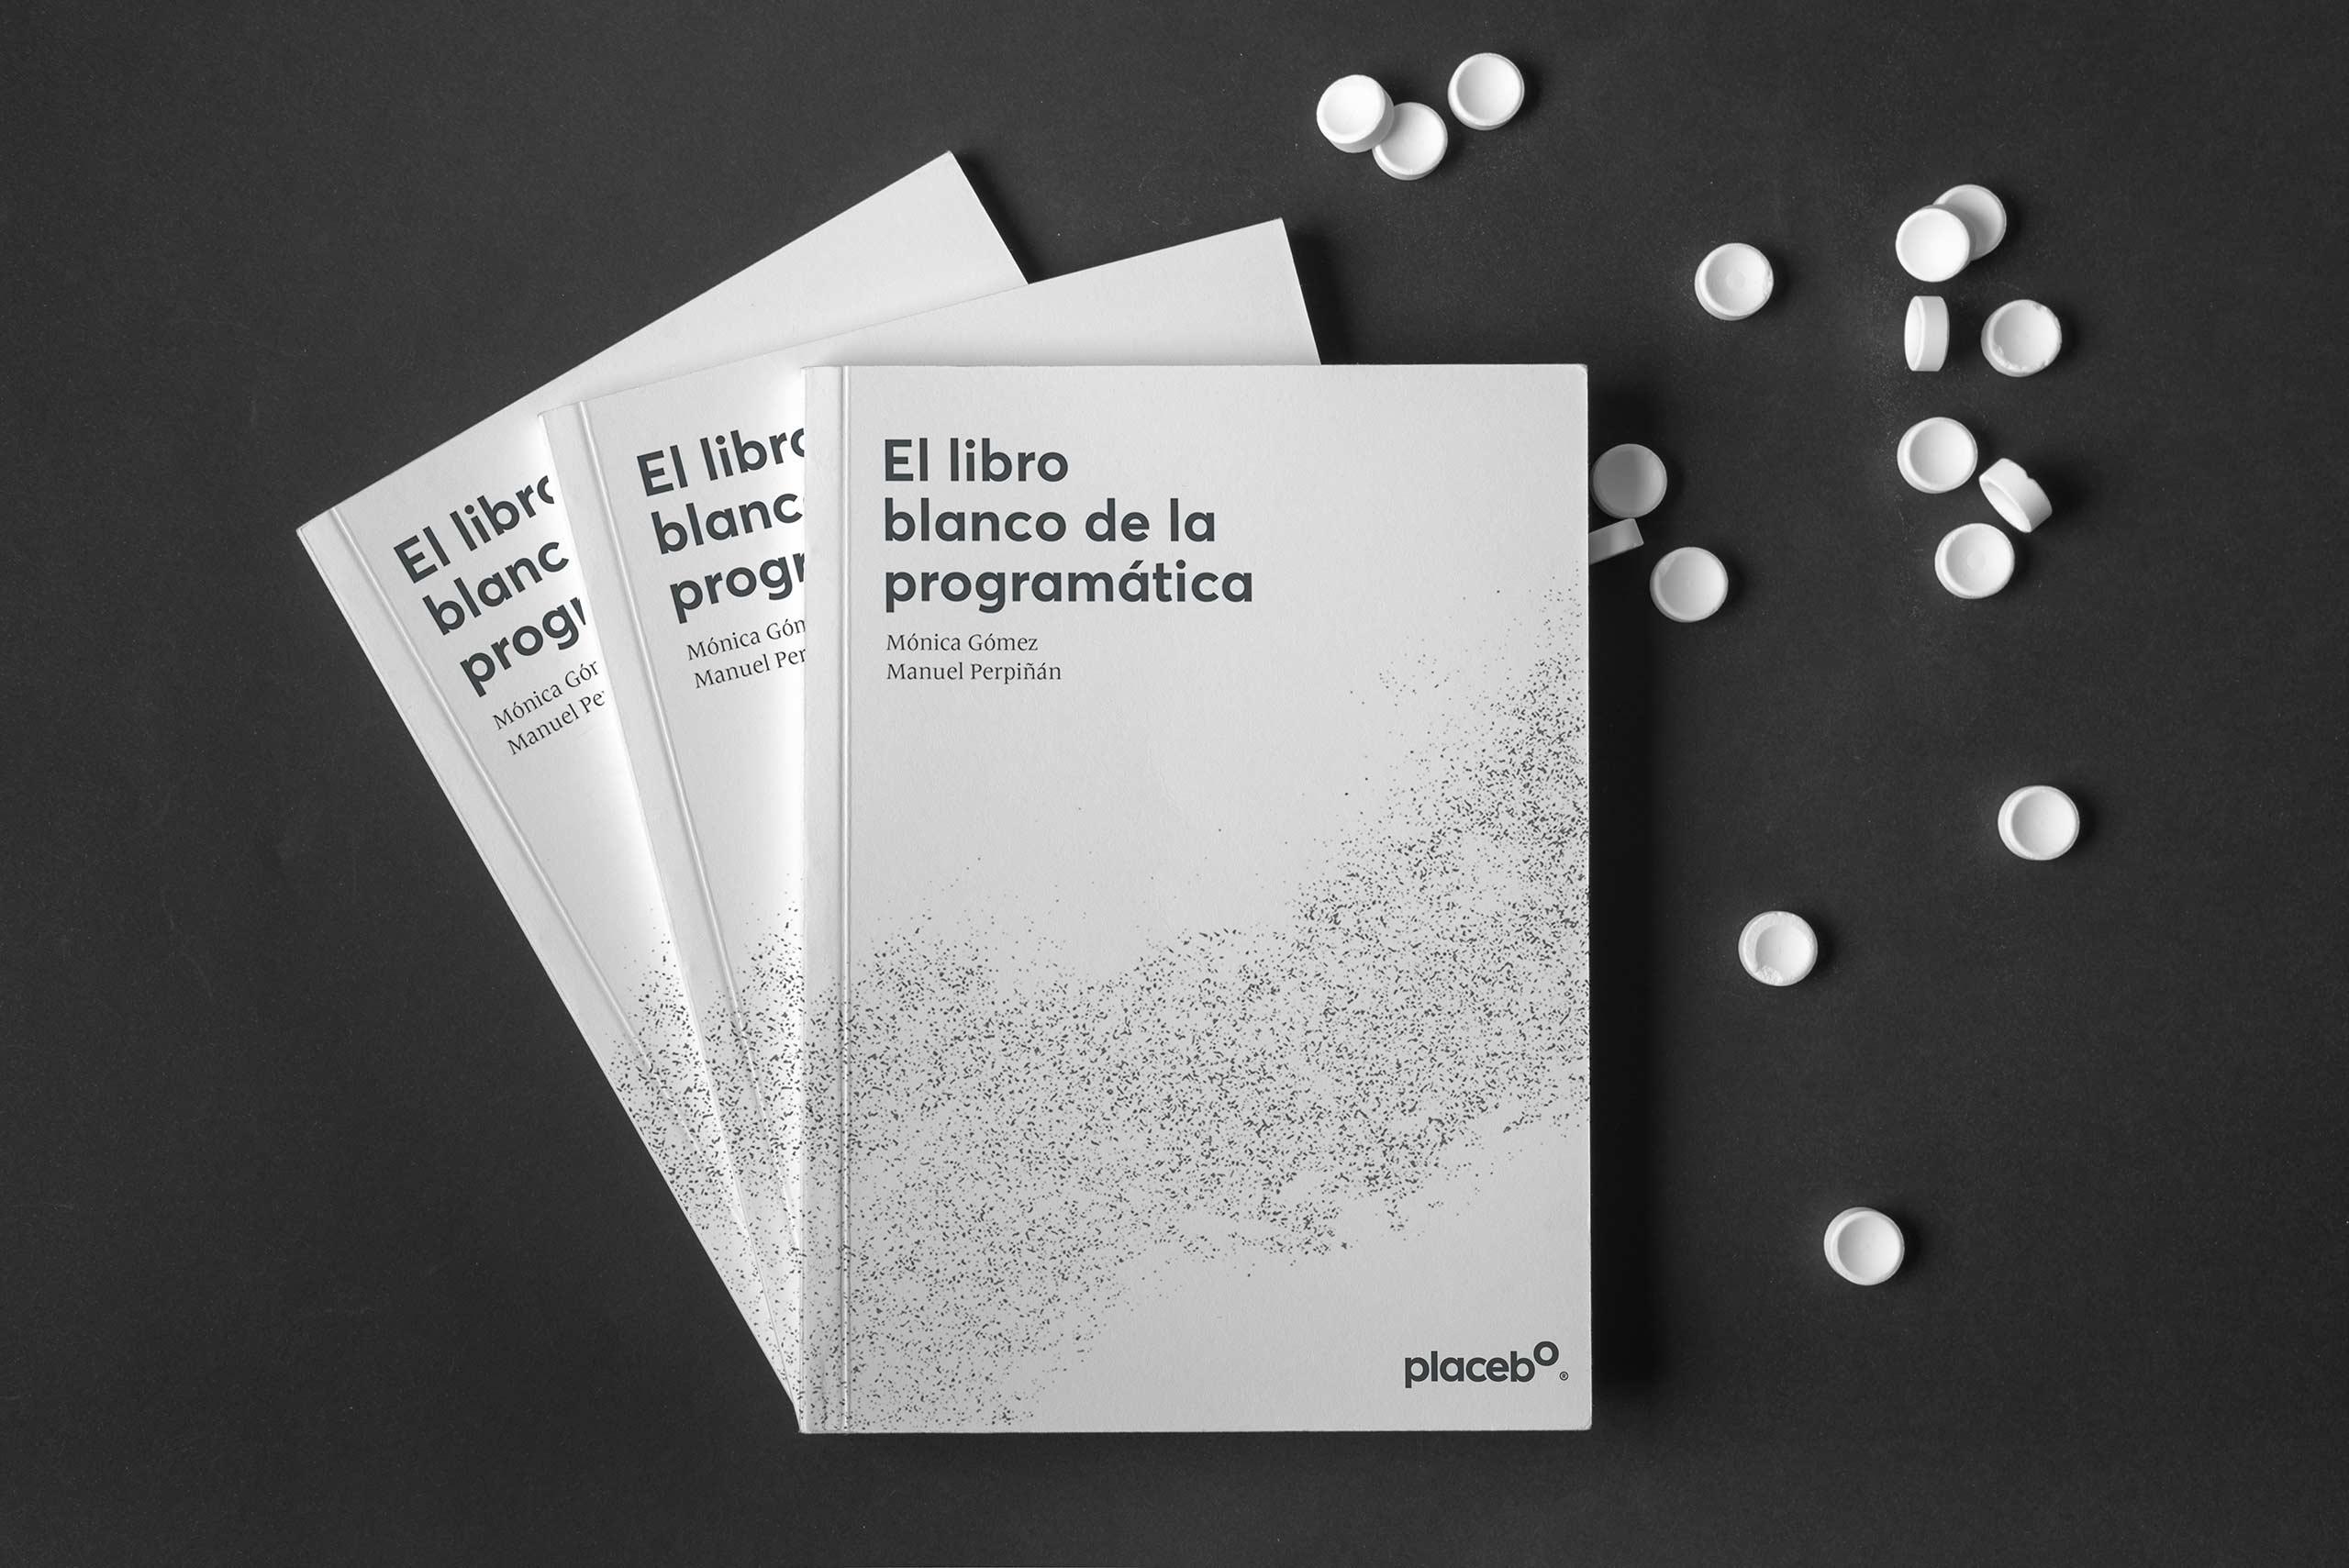 marinagoni-placebo-libros